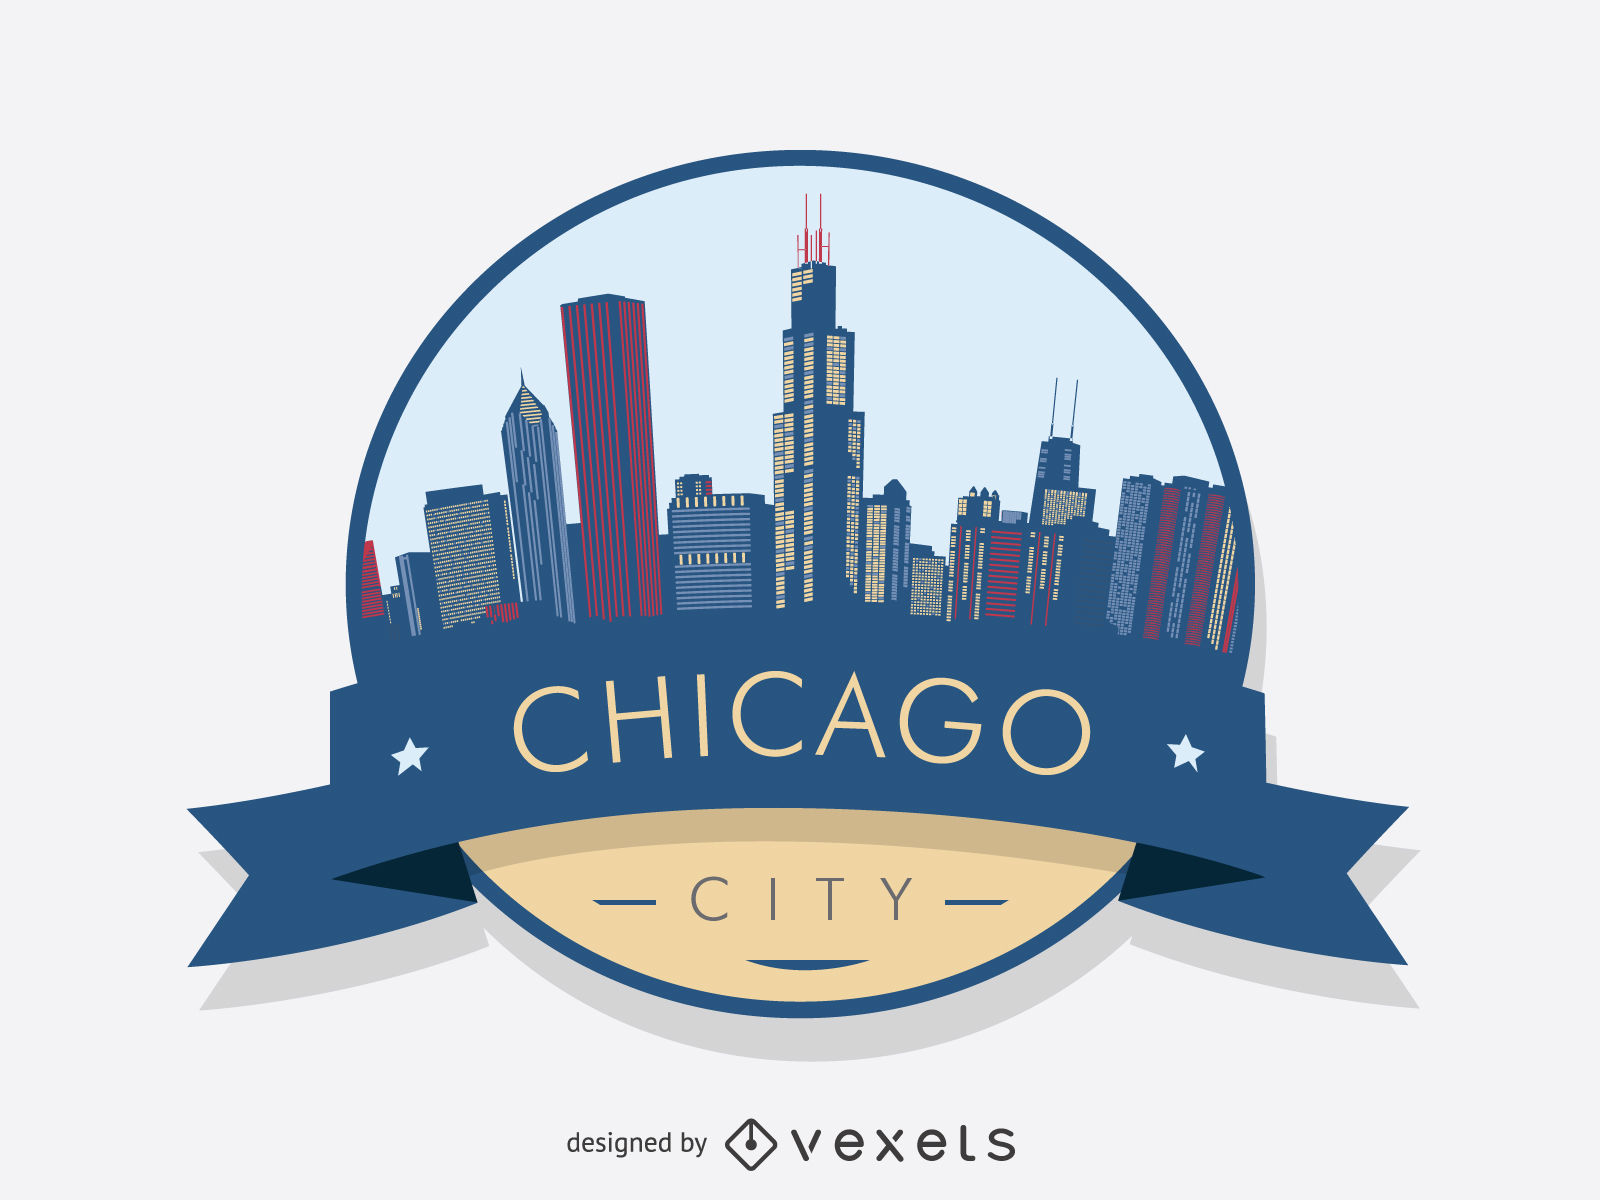 1600x1200 Chicago Skyline Silhouette